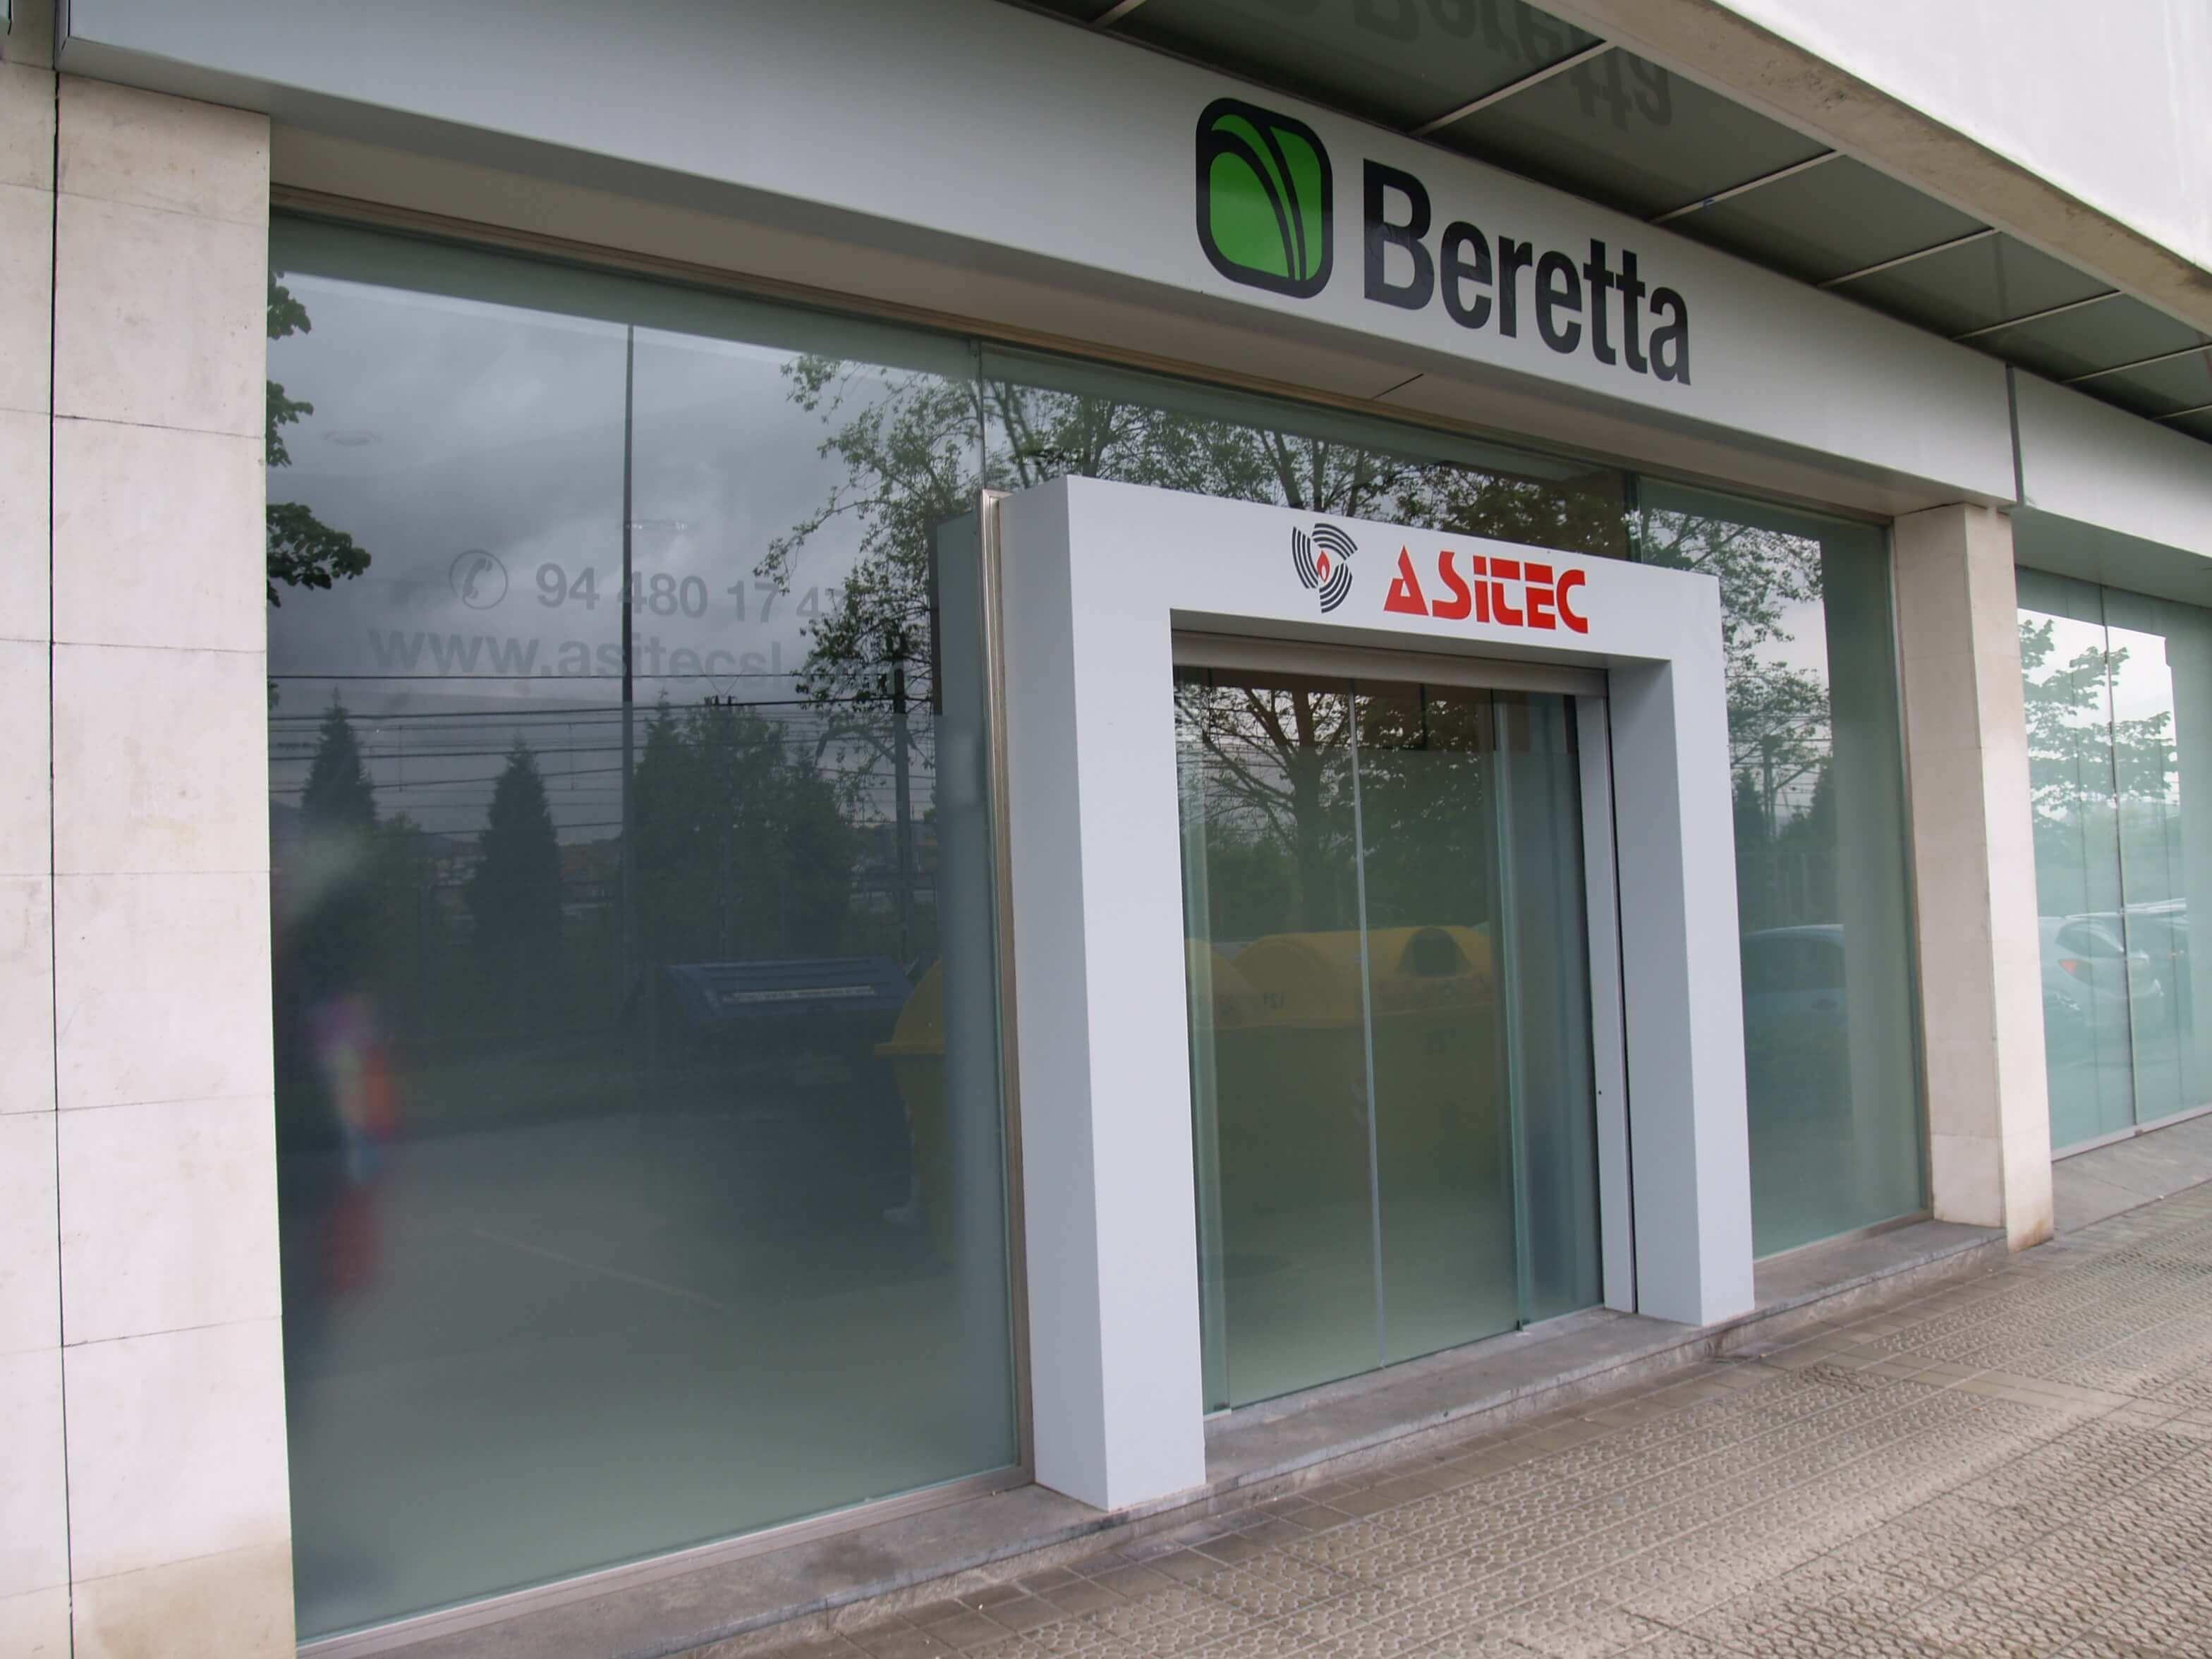 Servicio técnico Beretta en Bilbao